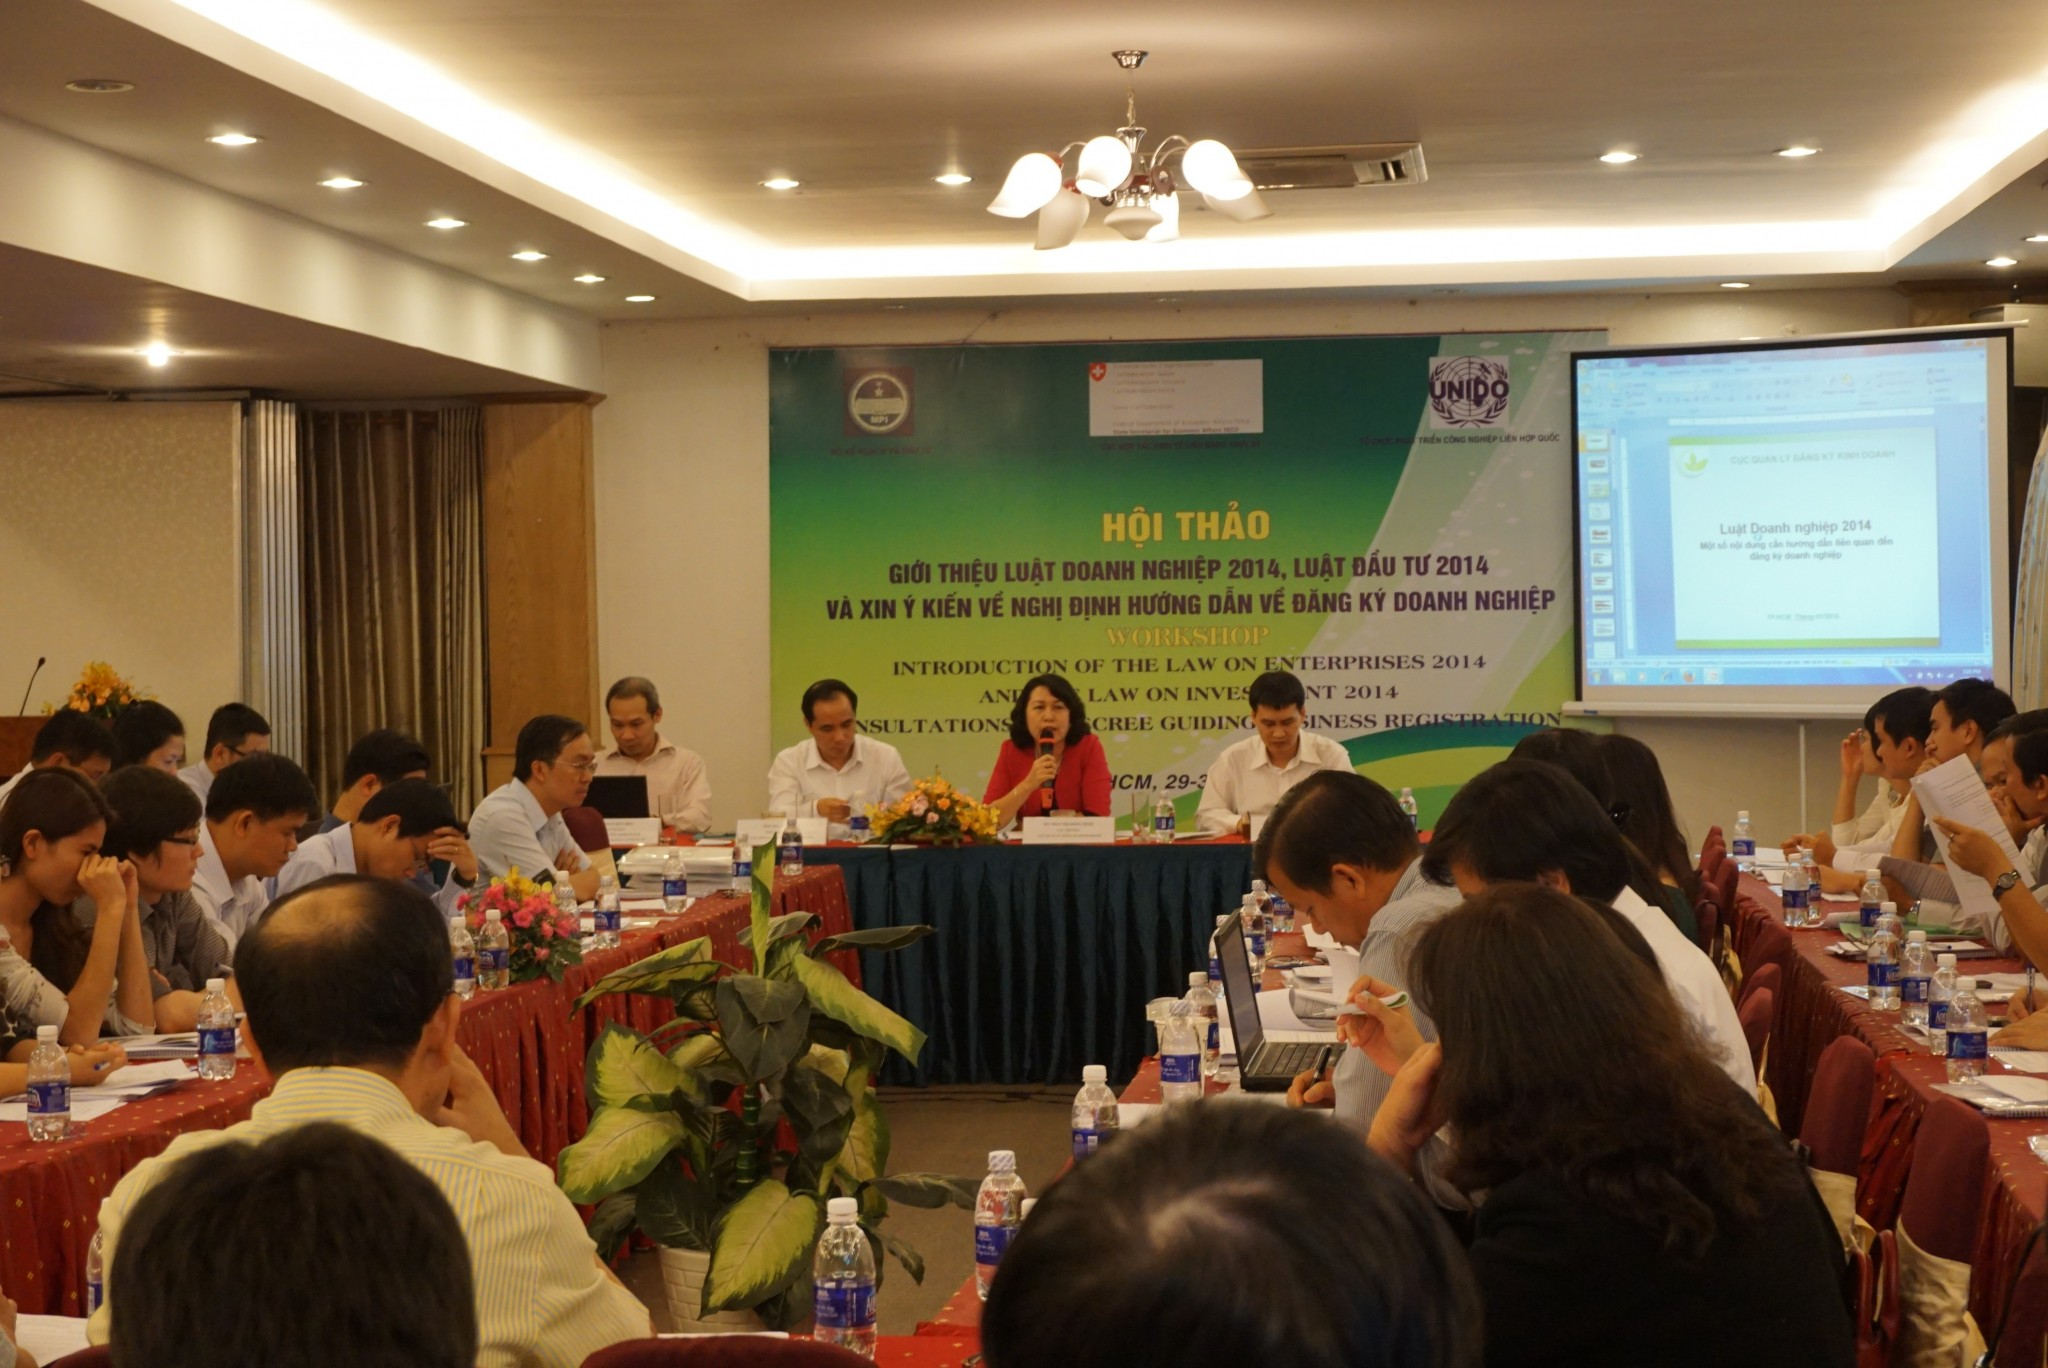 Provisions on legal representative under the Enterprise Law 2014